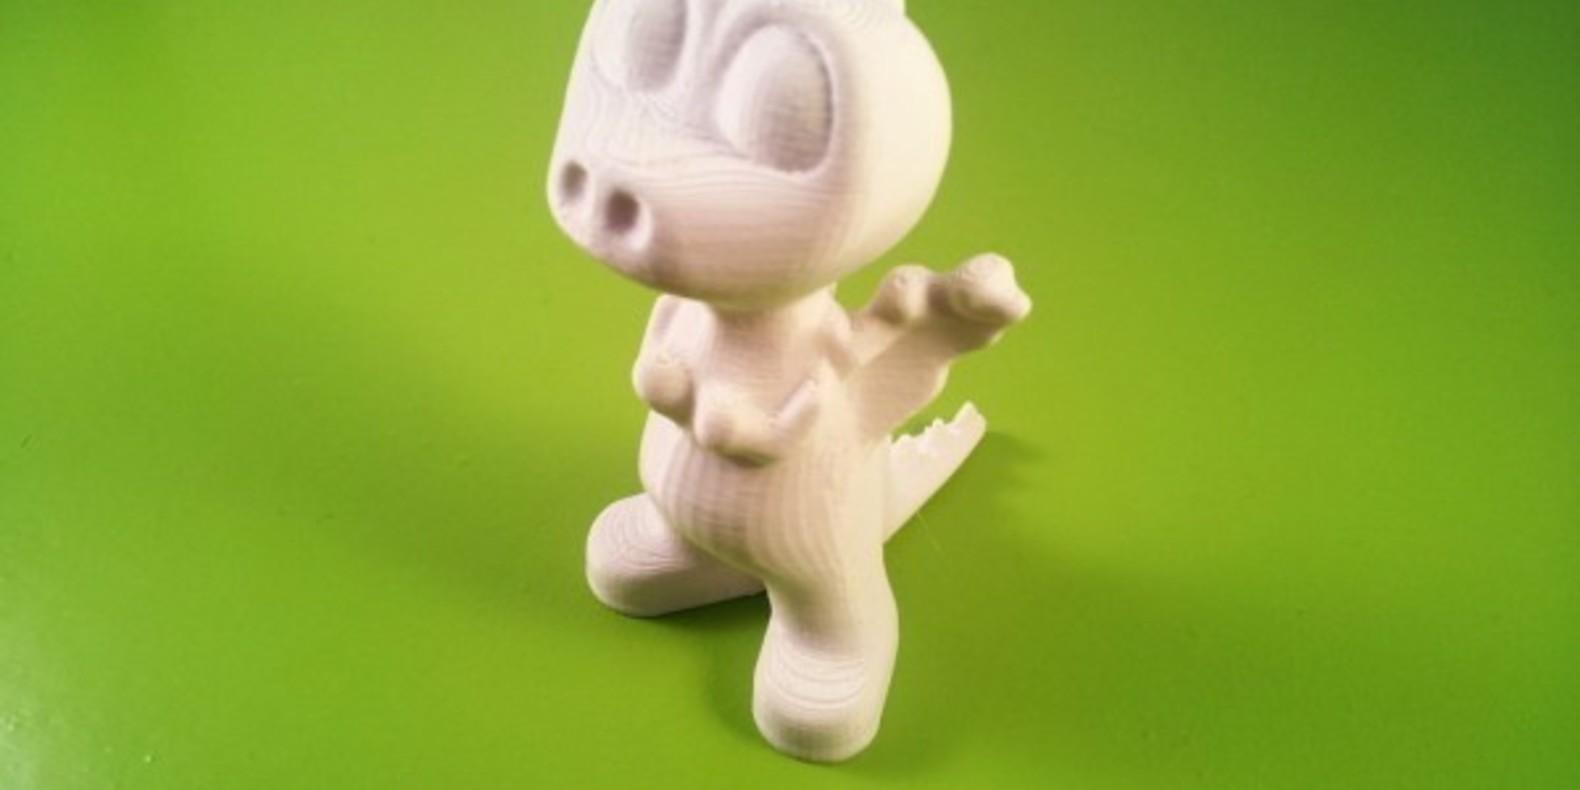 dolf veenvliet macouno cults3D cults designer artist 3D printing monkey skull dragon minotaur dorus manus 21